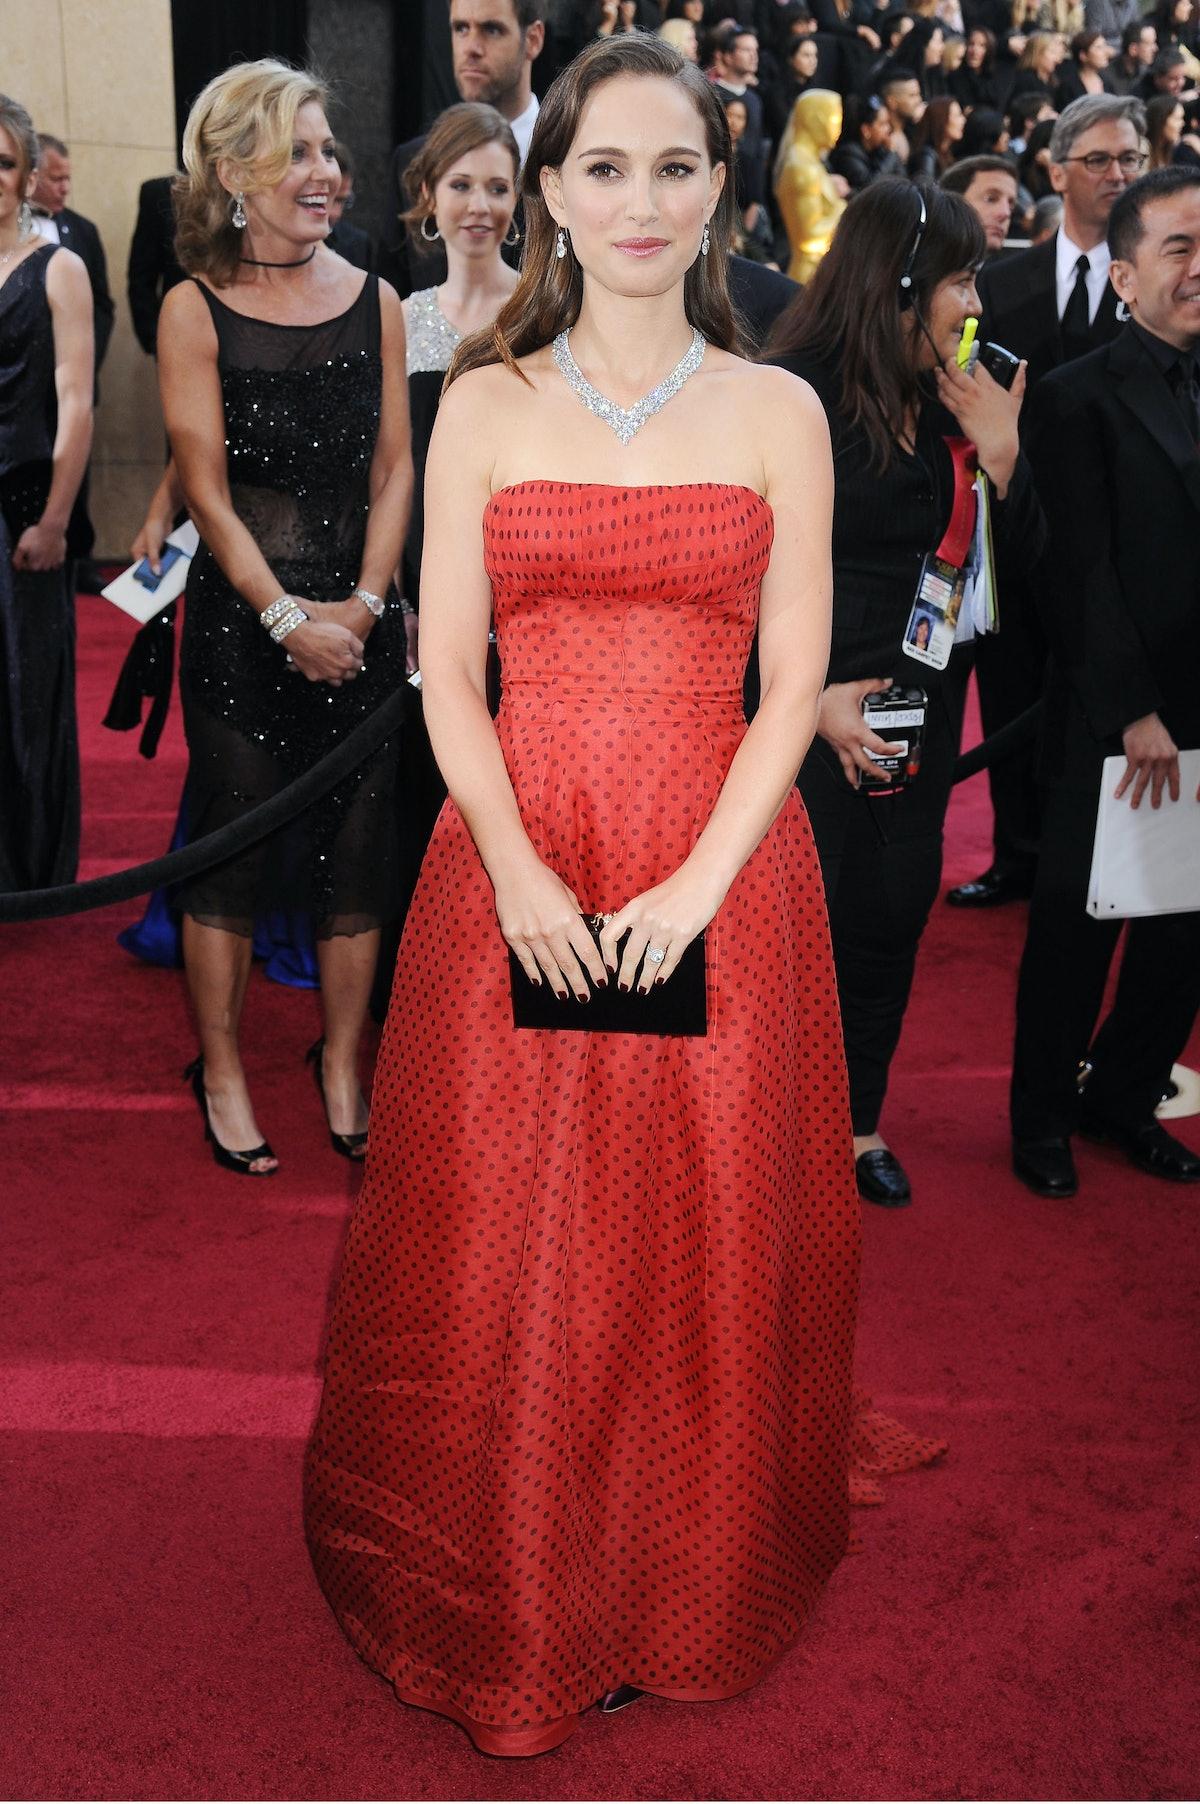 Natalie Portman in Red